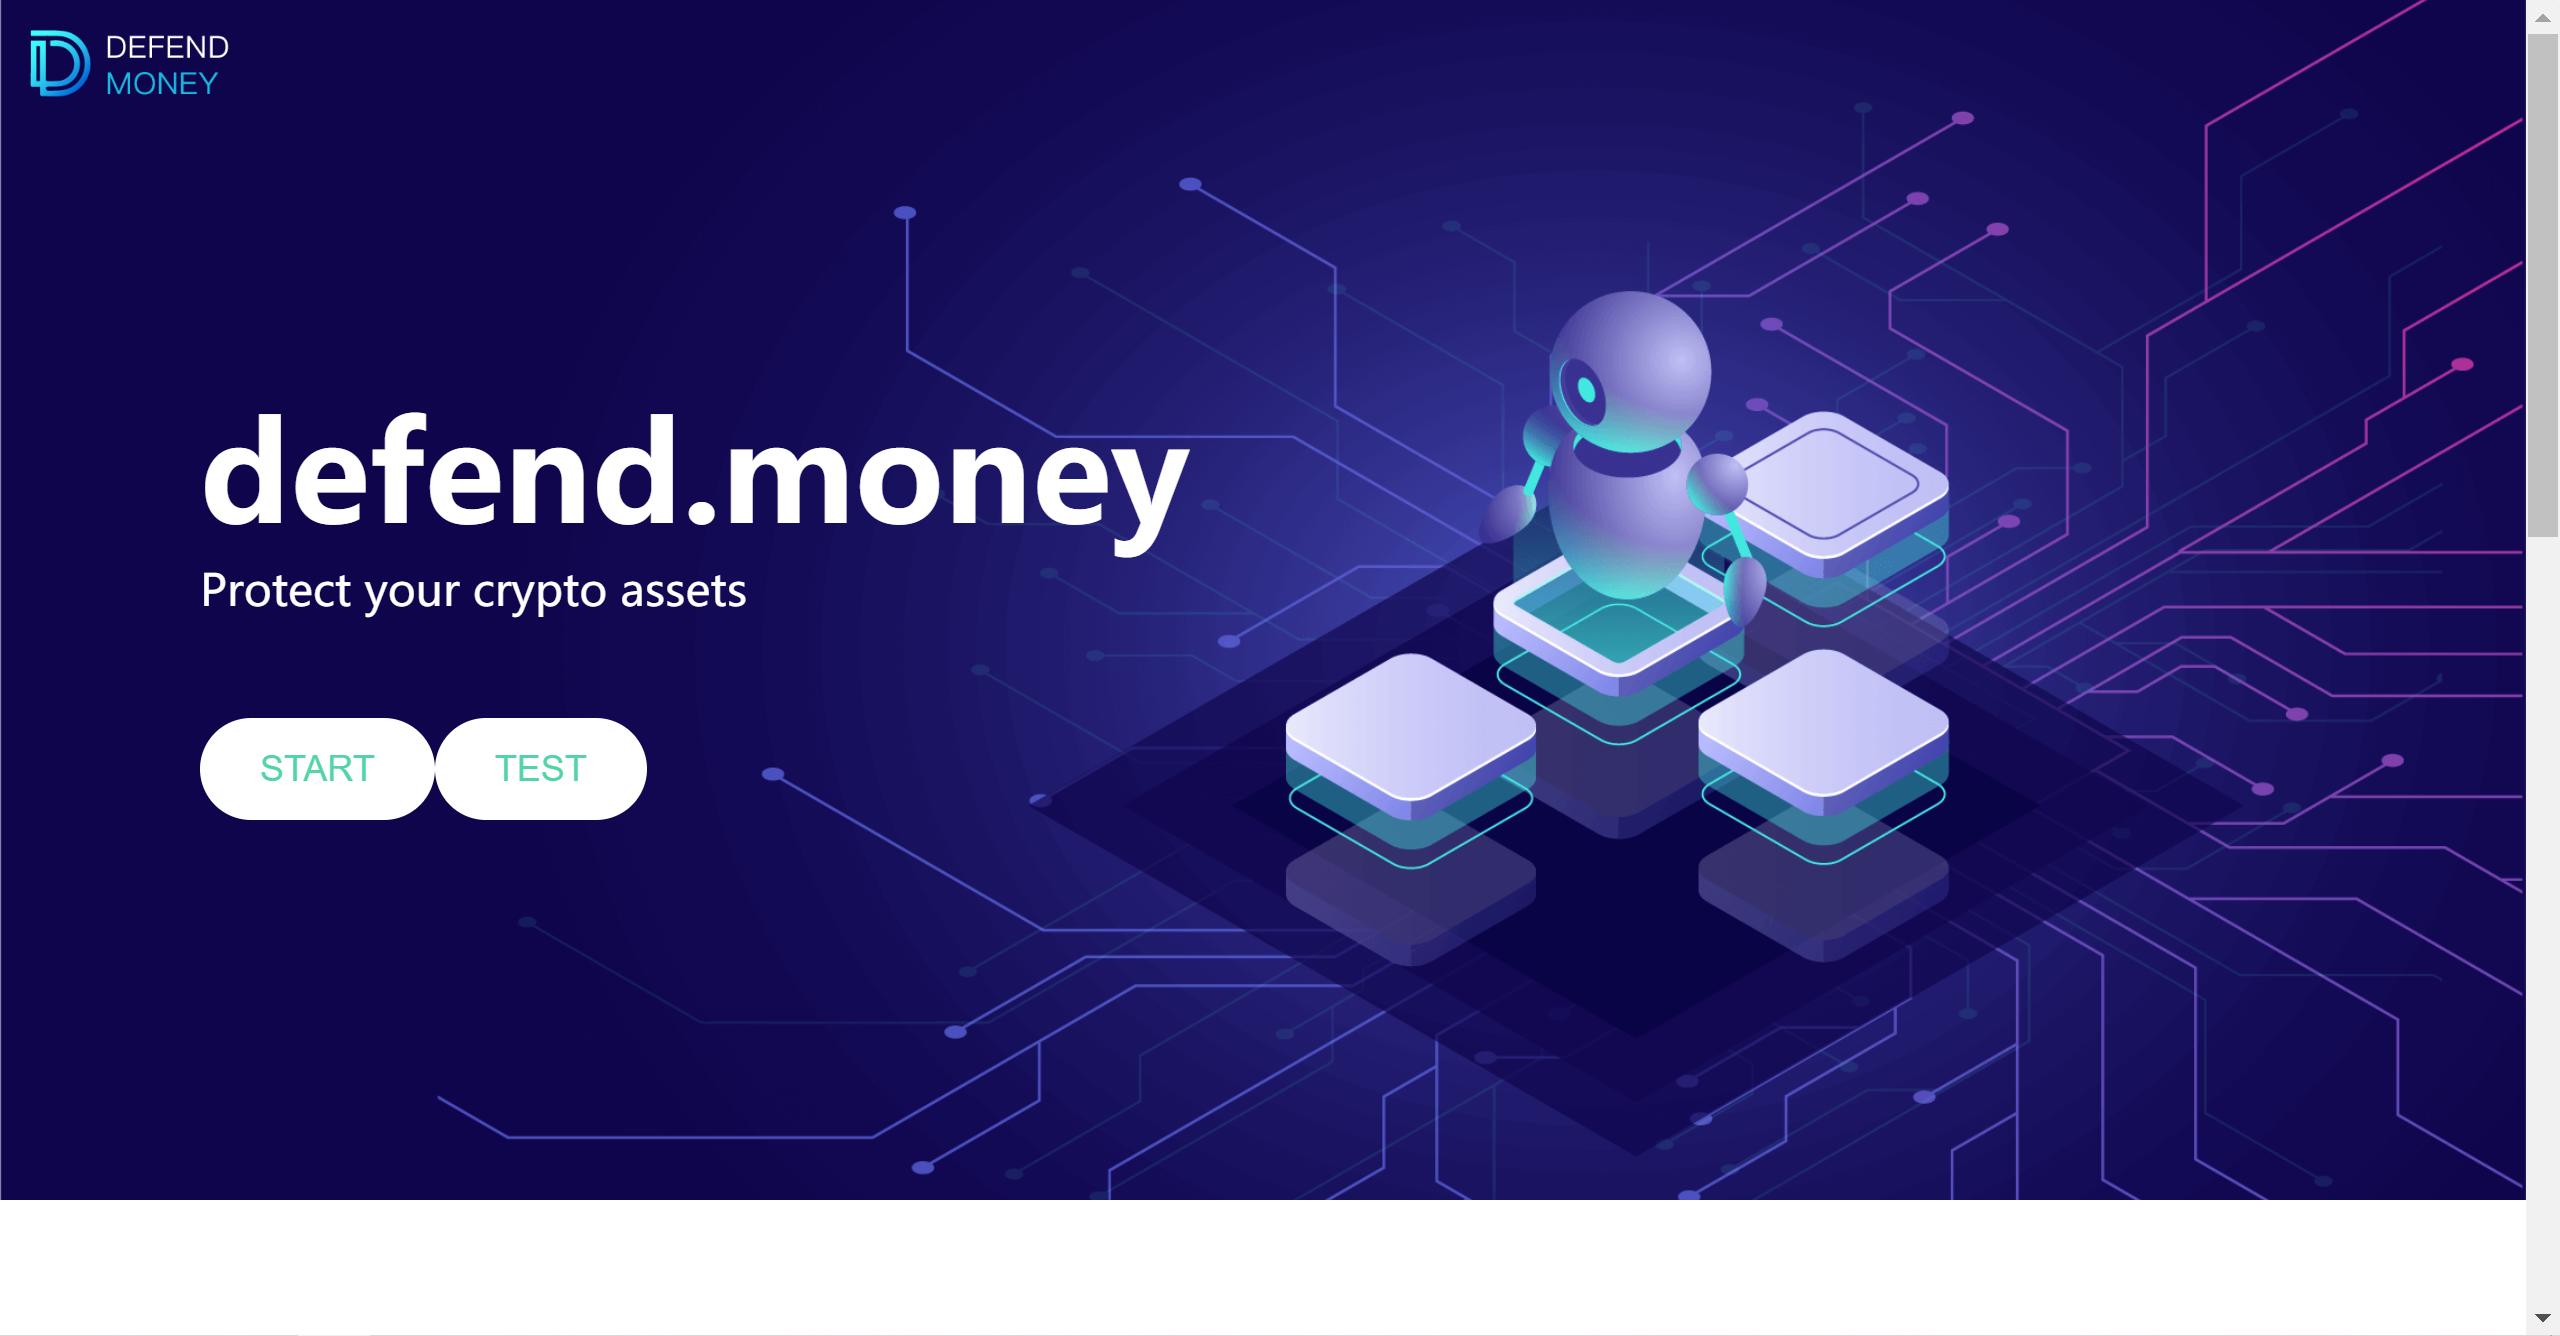 defend.money showcase